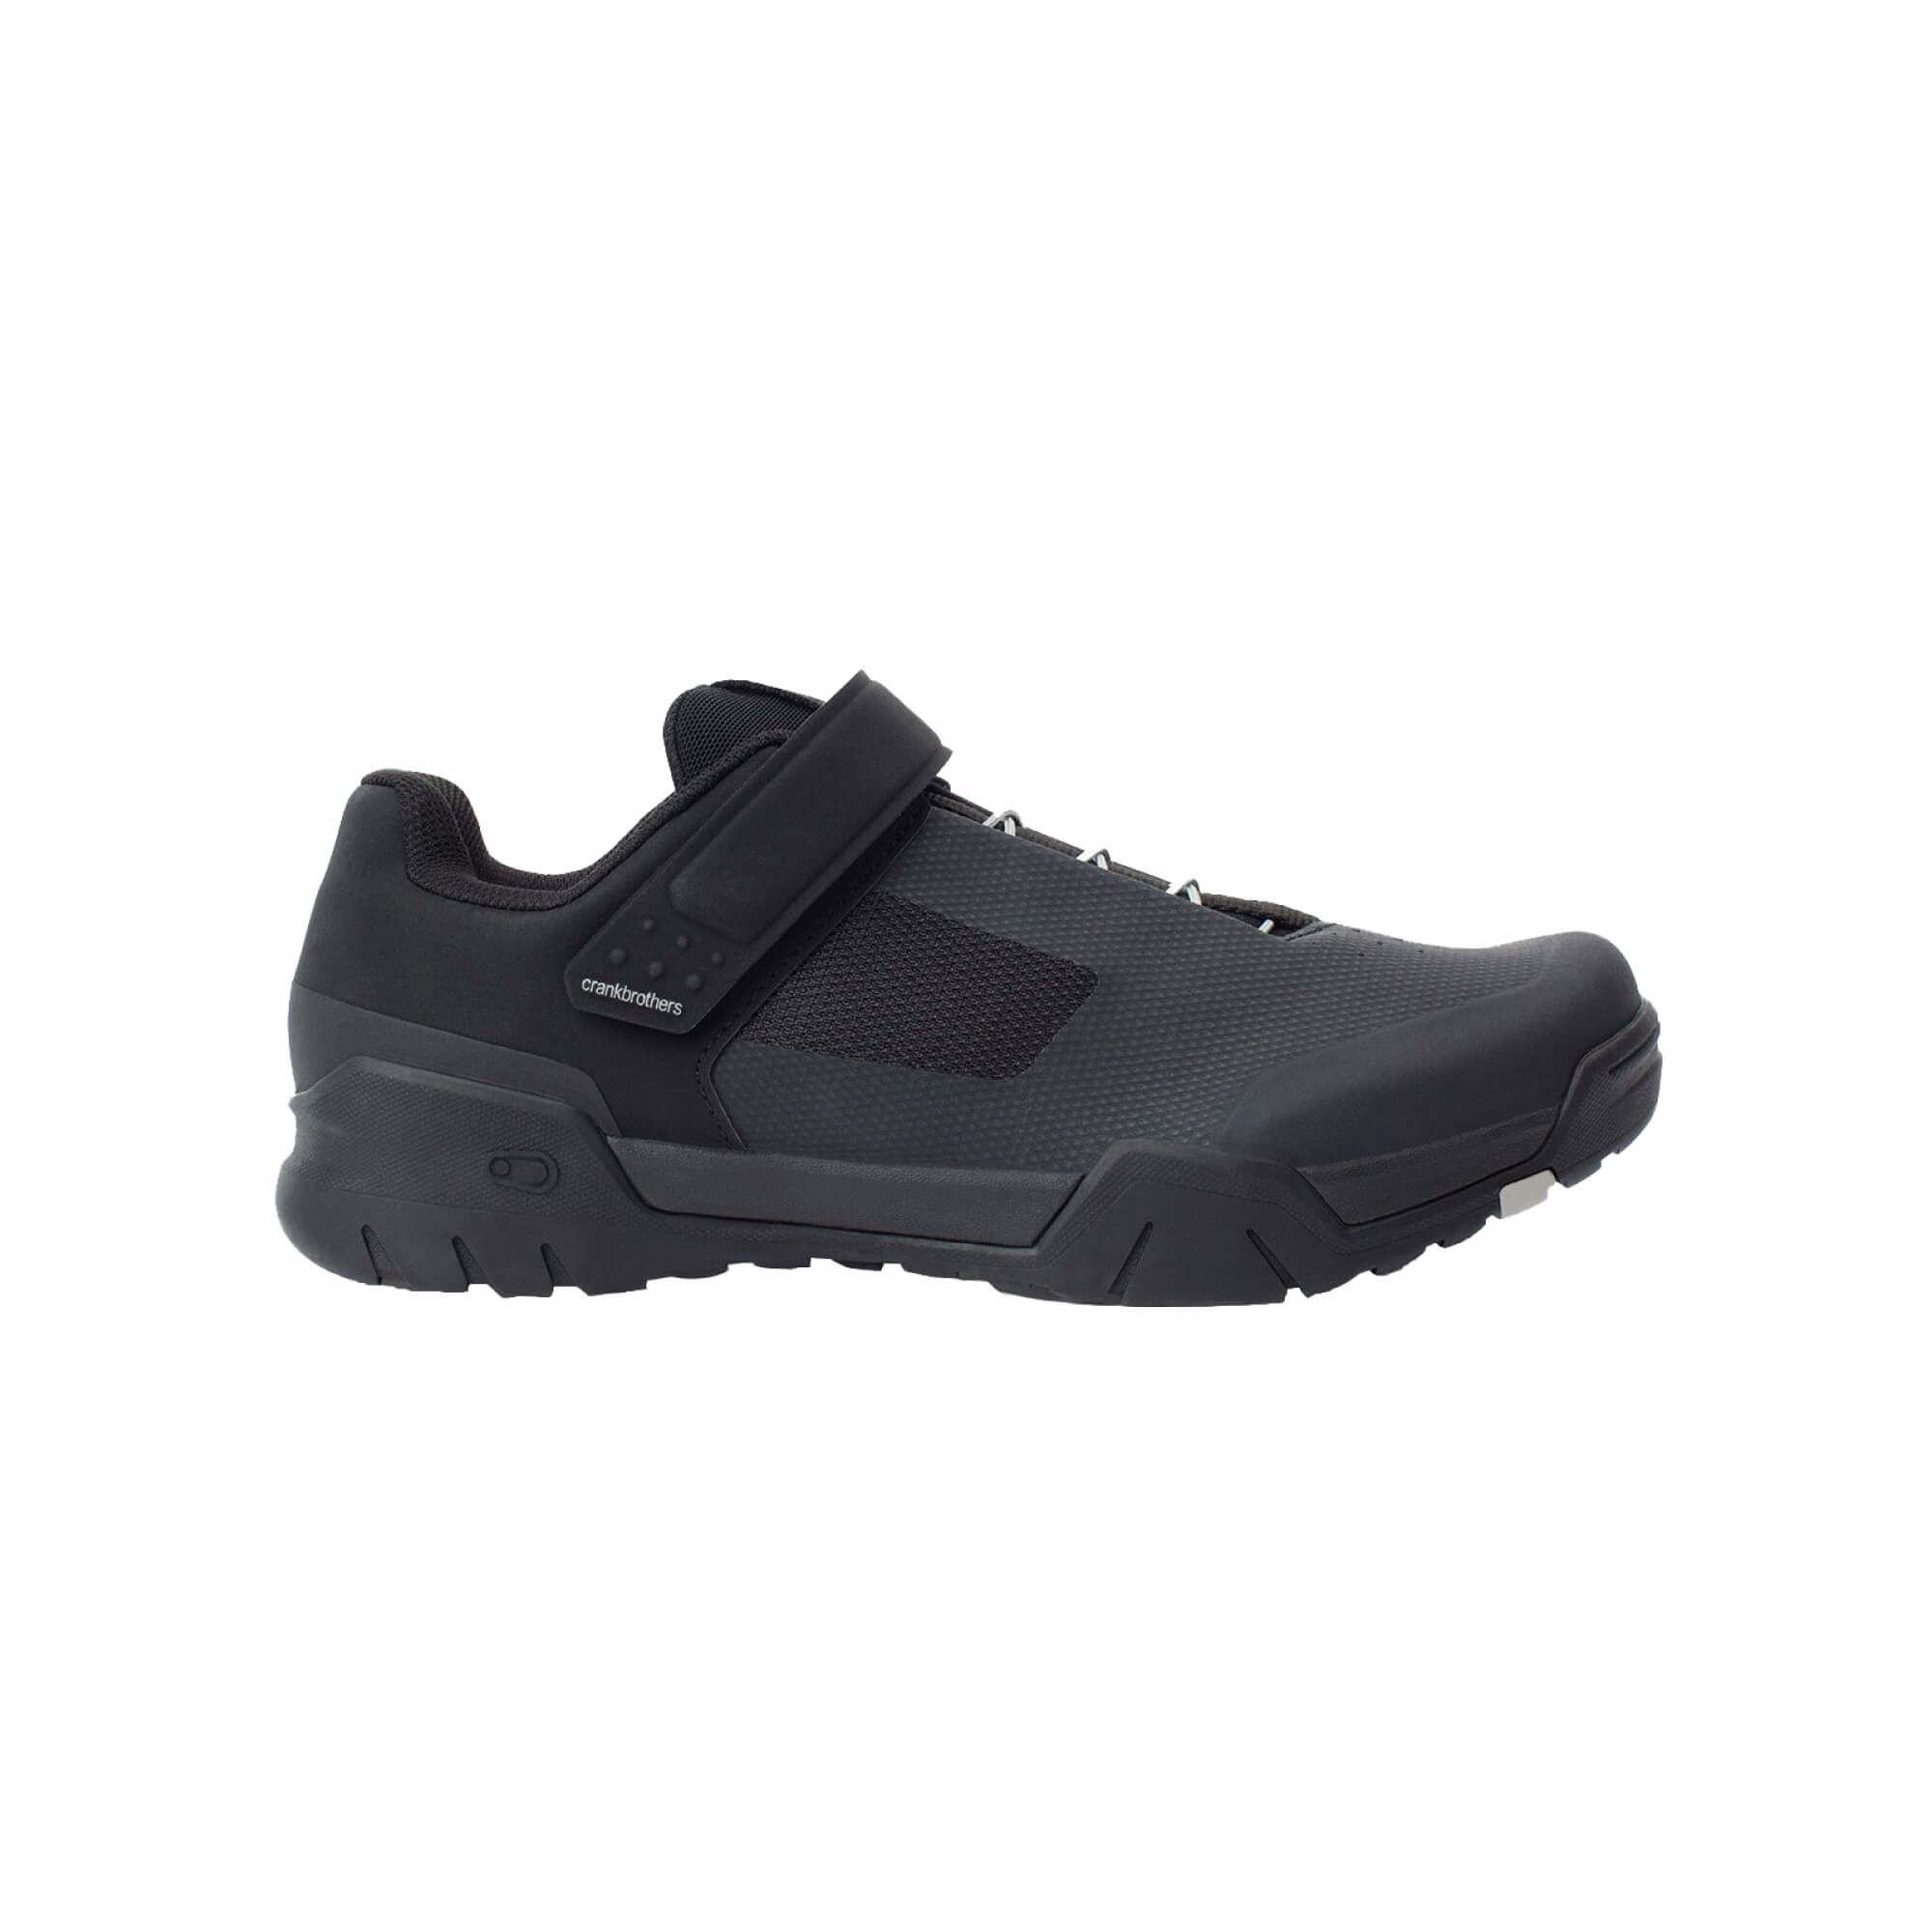 Shoes Mallet Speedlace Clipless Spd-1